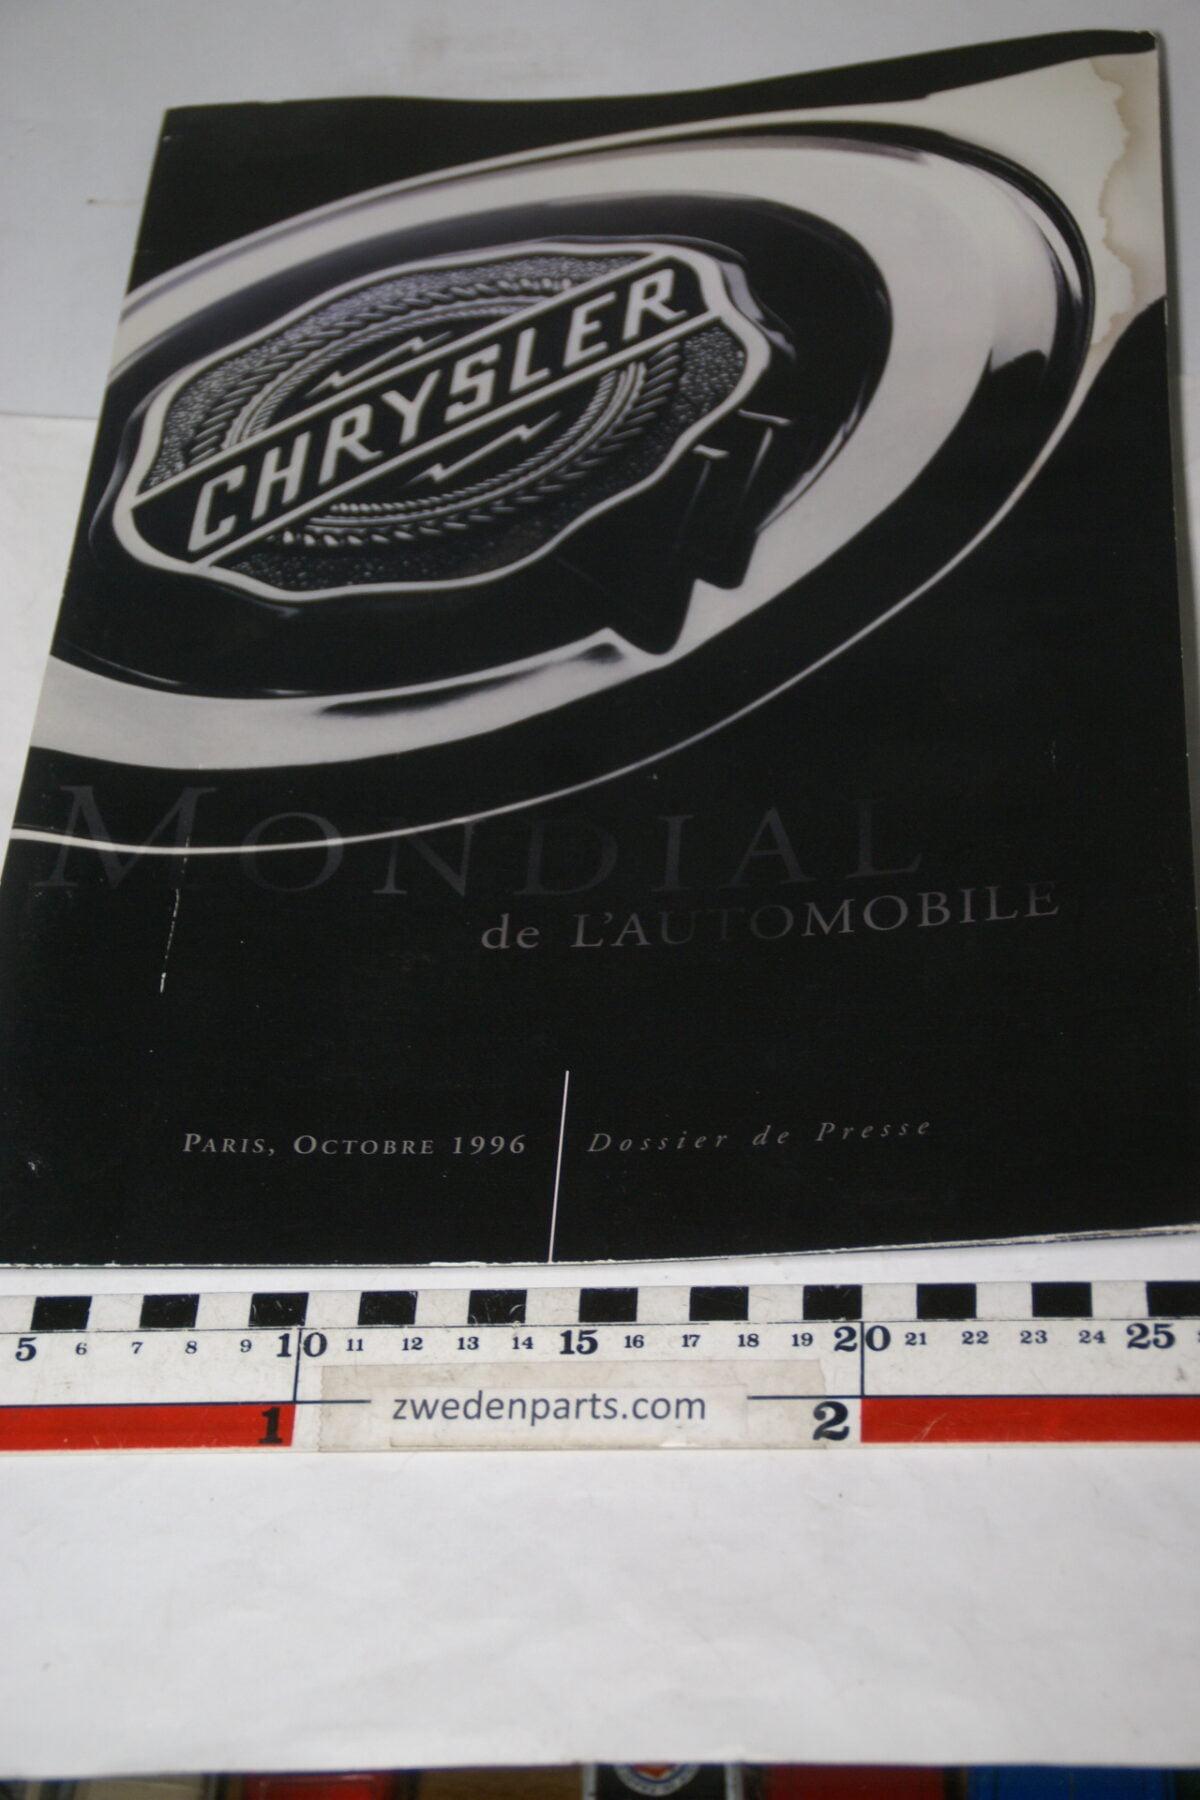 DSC01775 1996 persmap origineel Chrysler Jeep, Viper etc. Francais-ebe05ea4